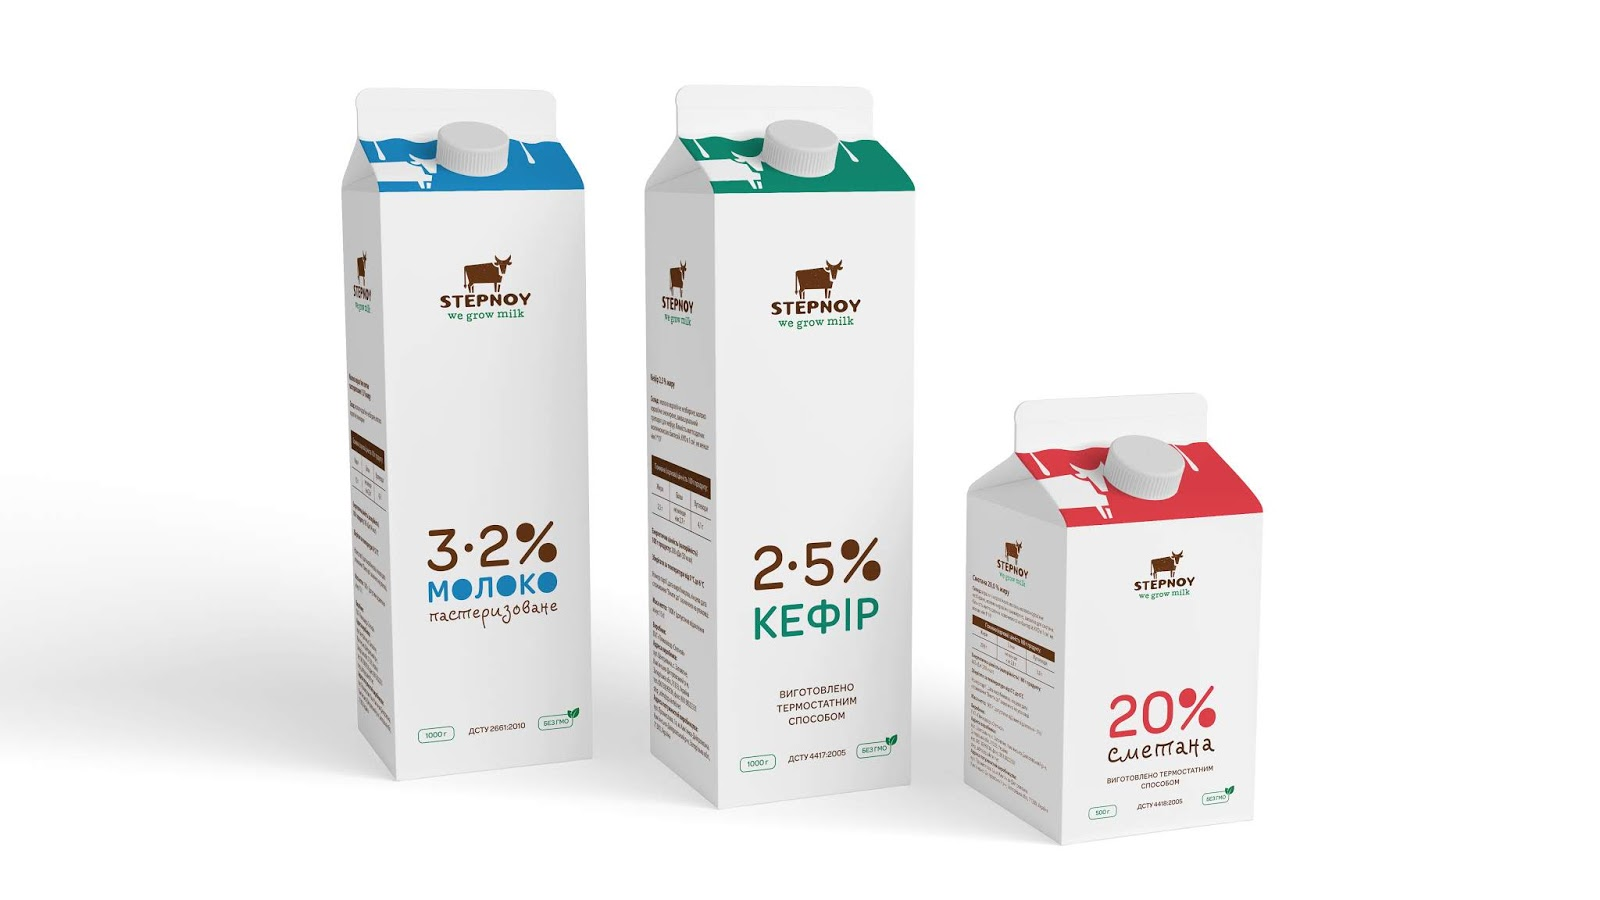 Stepnoy牛奶包装设计